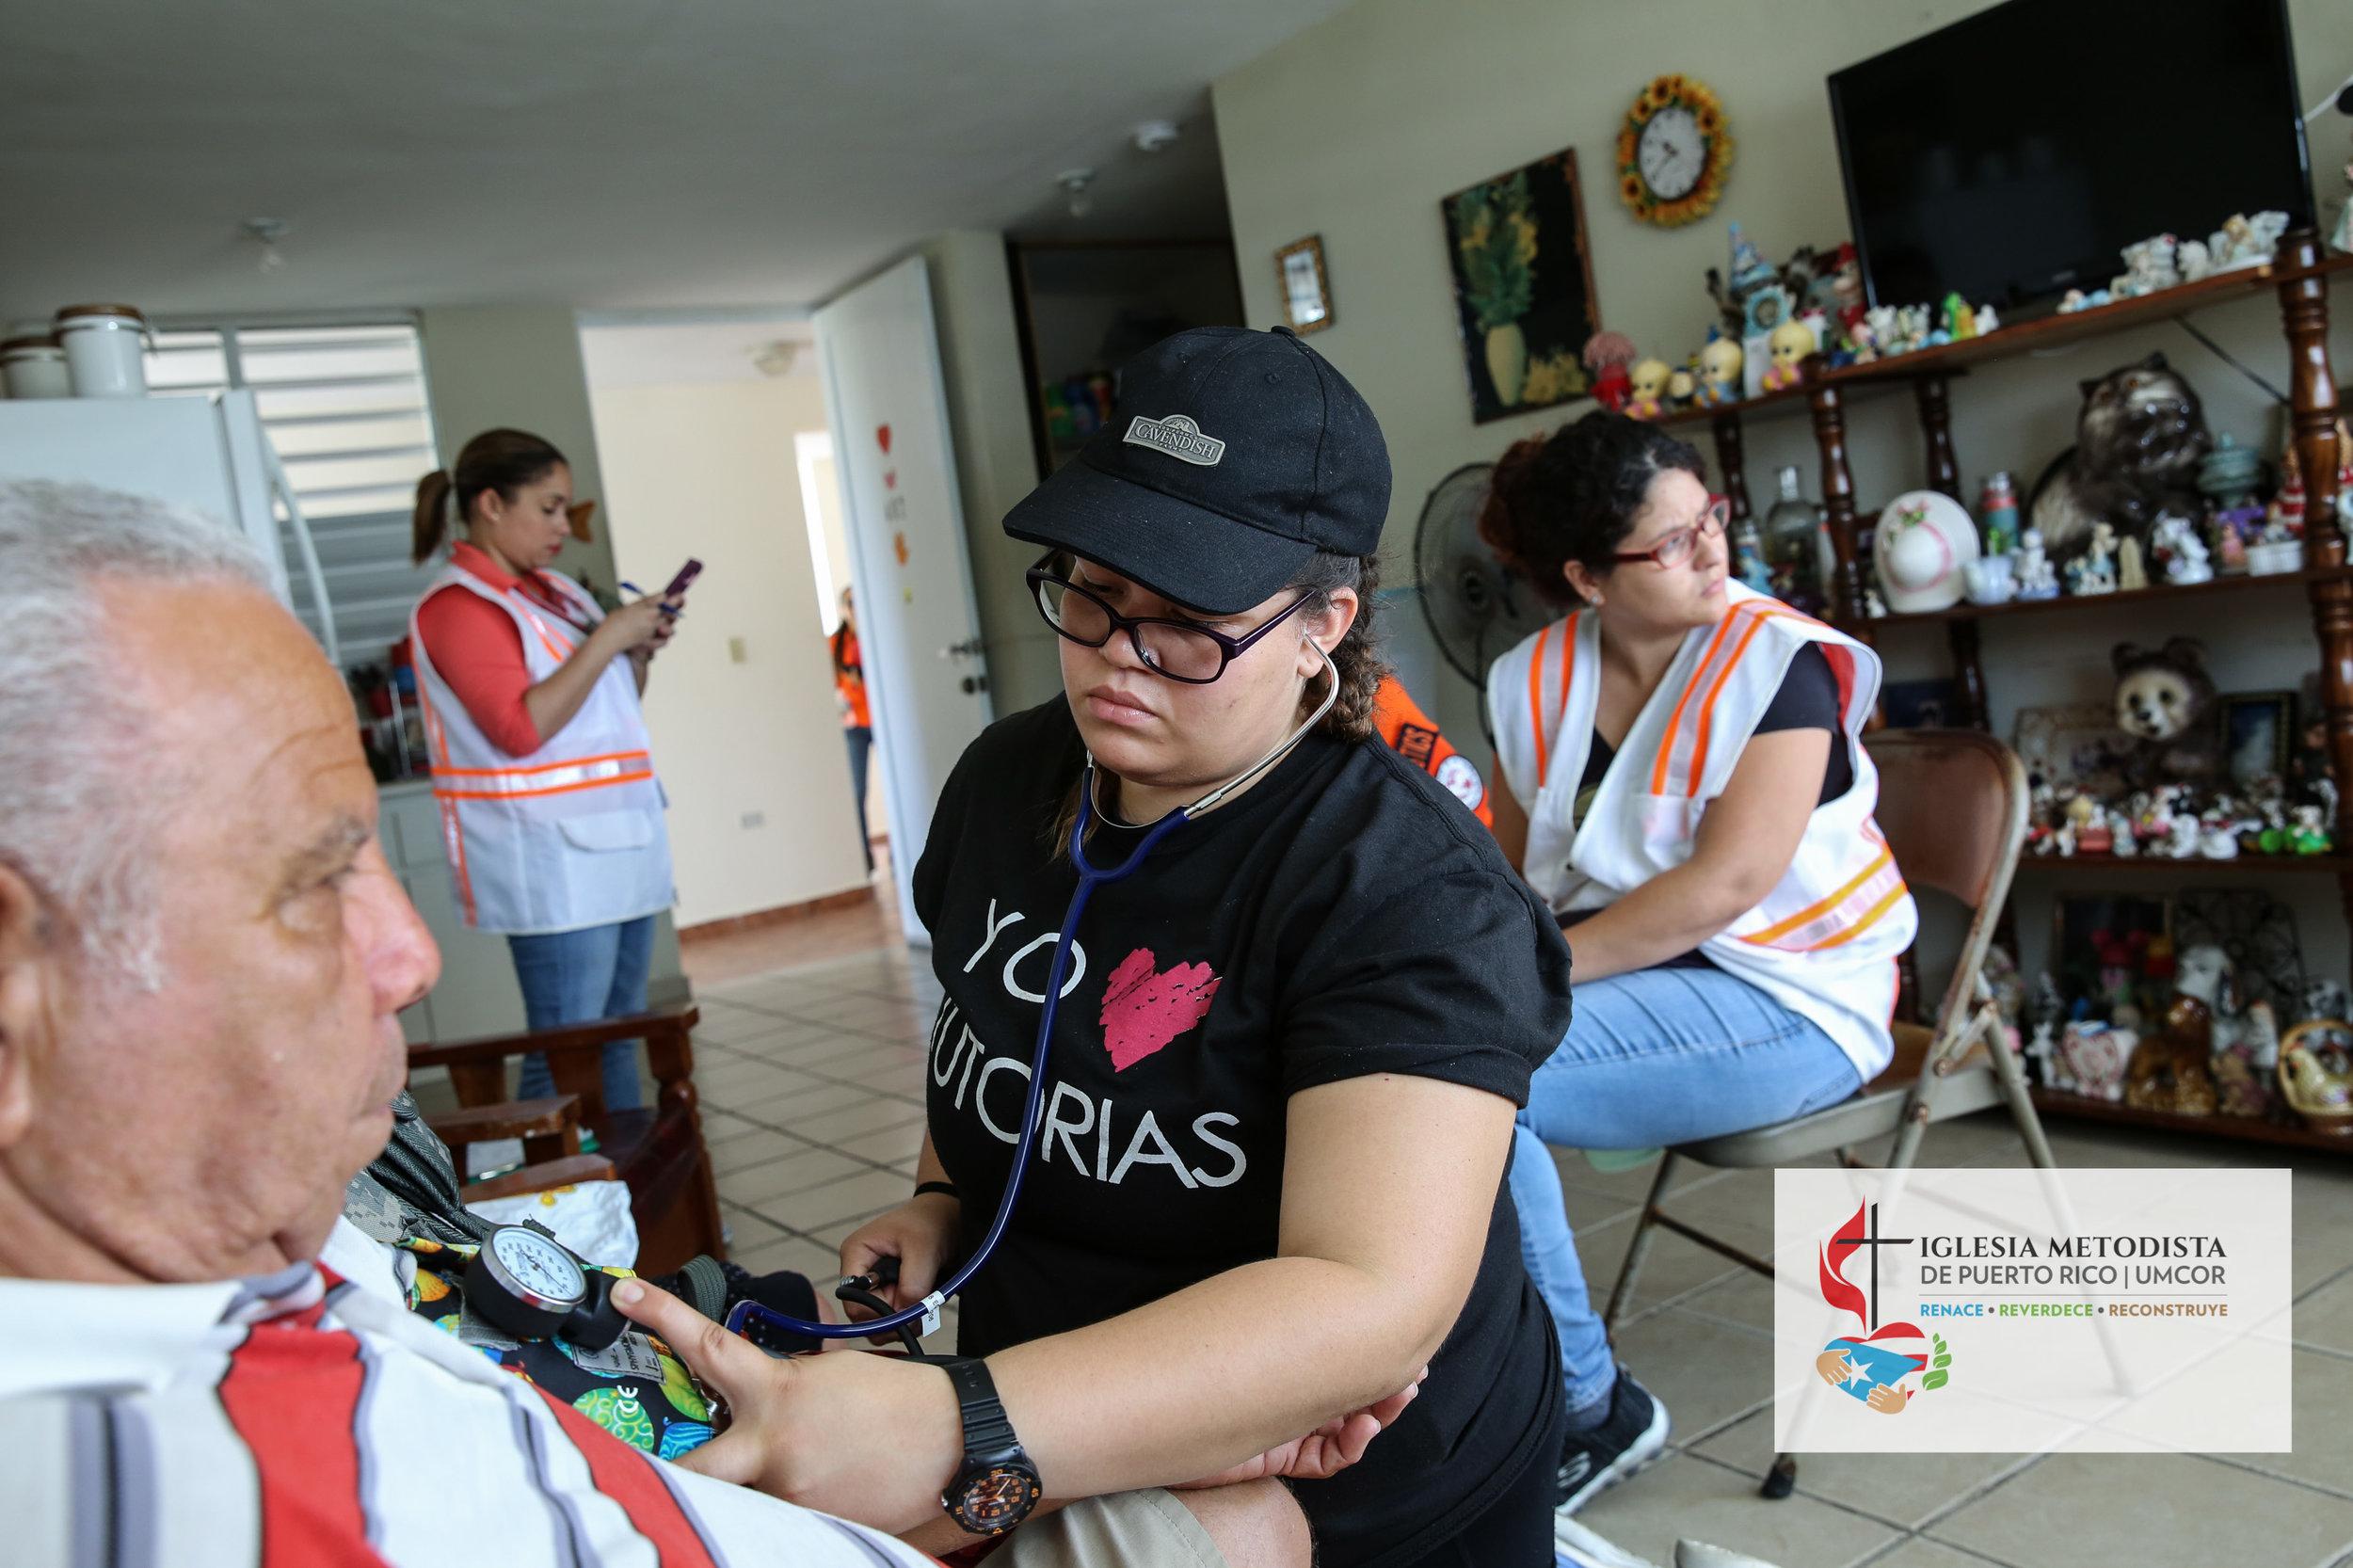 Fotos Clínicas de Salud Vieques_Abril 2018-ESG52437.JPG